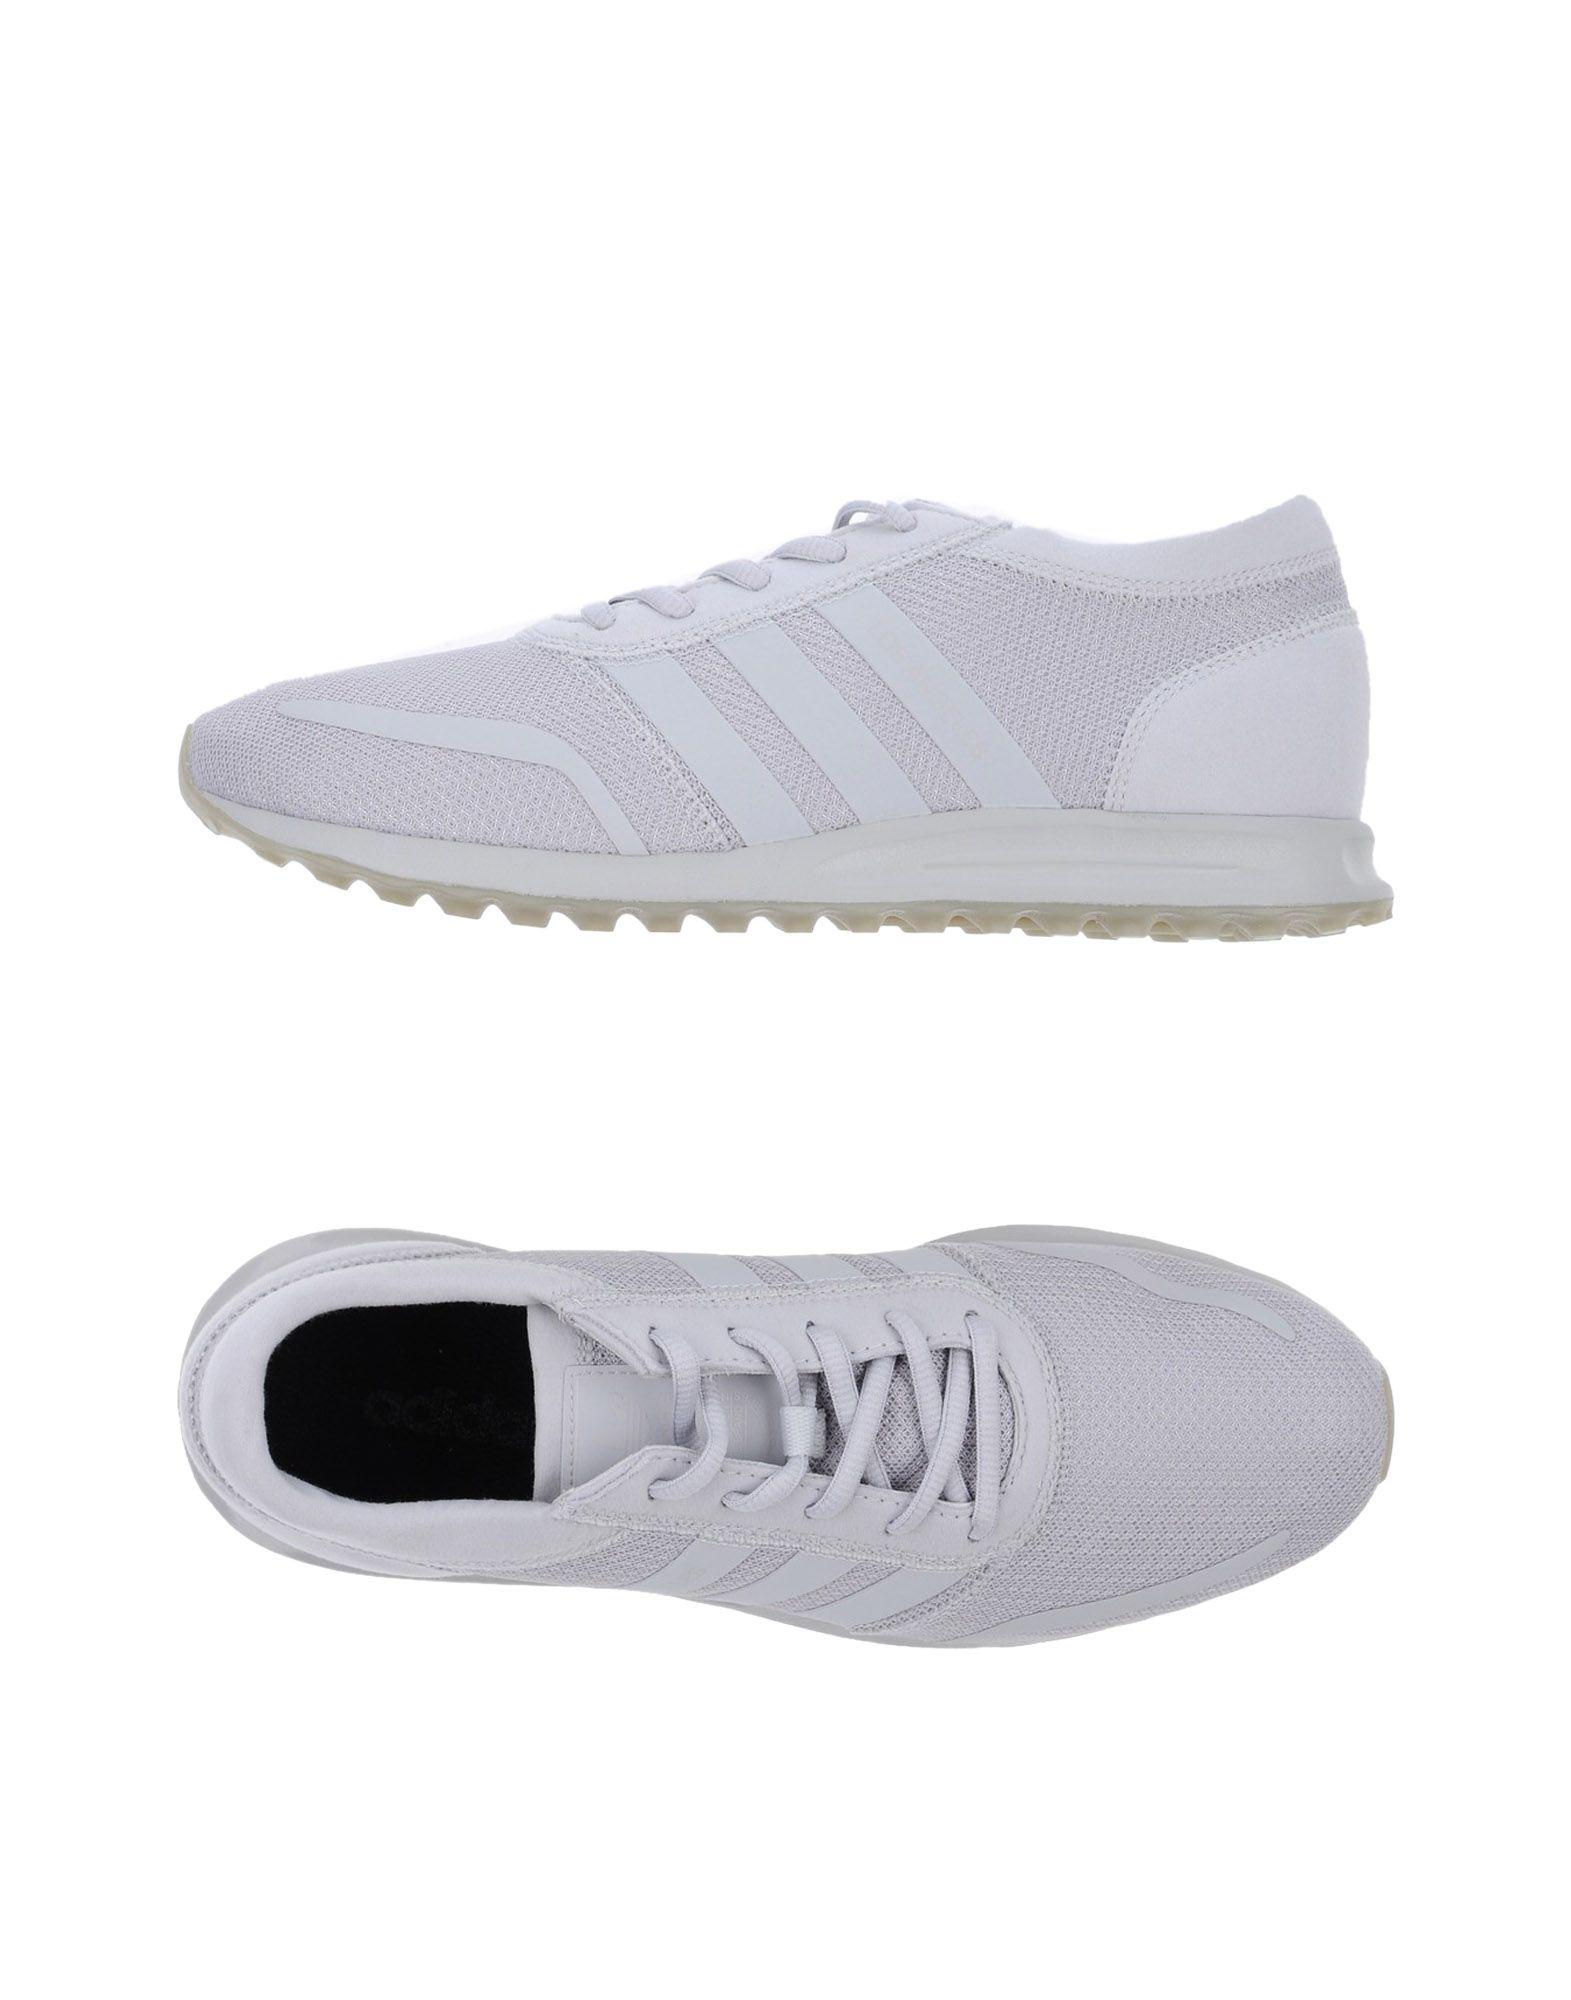 Sneakers Adidas Originals Uomo - 11335337GK